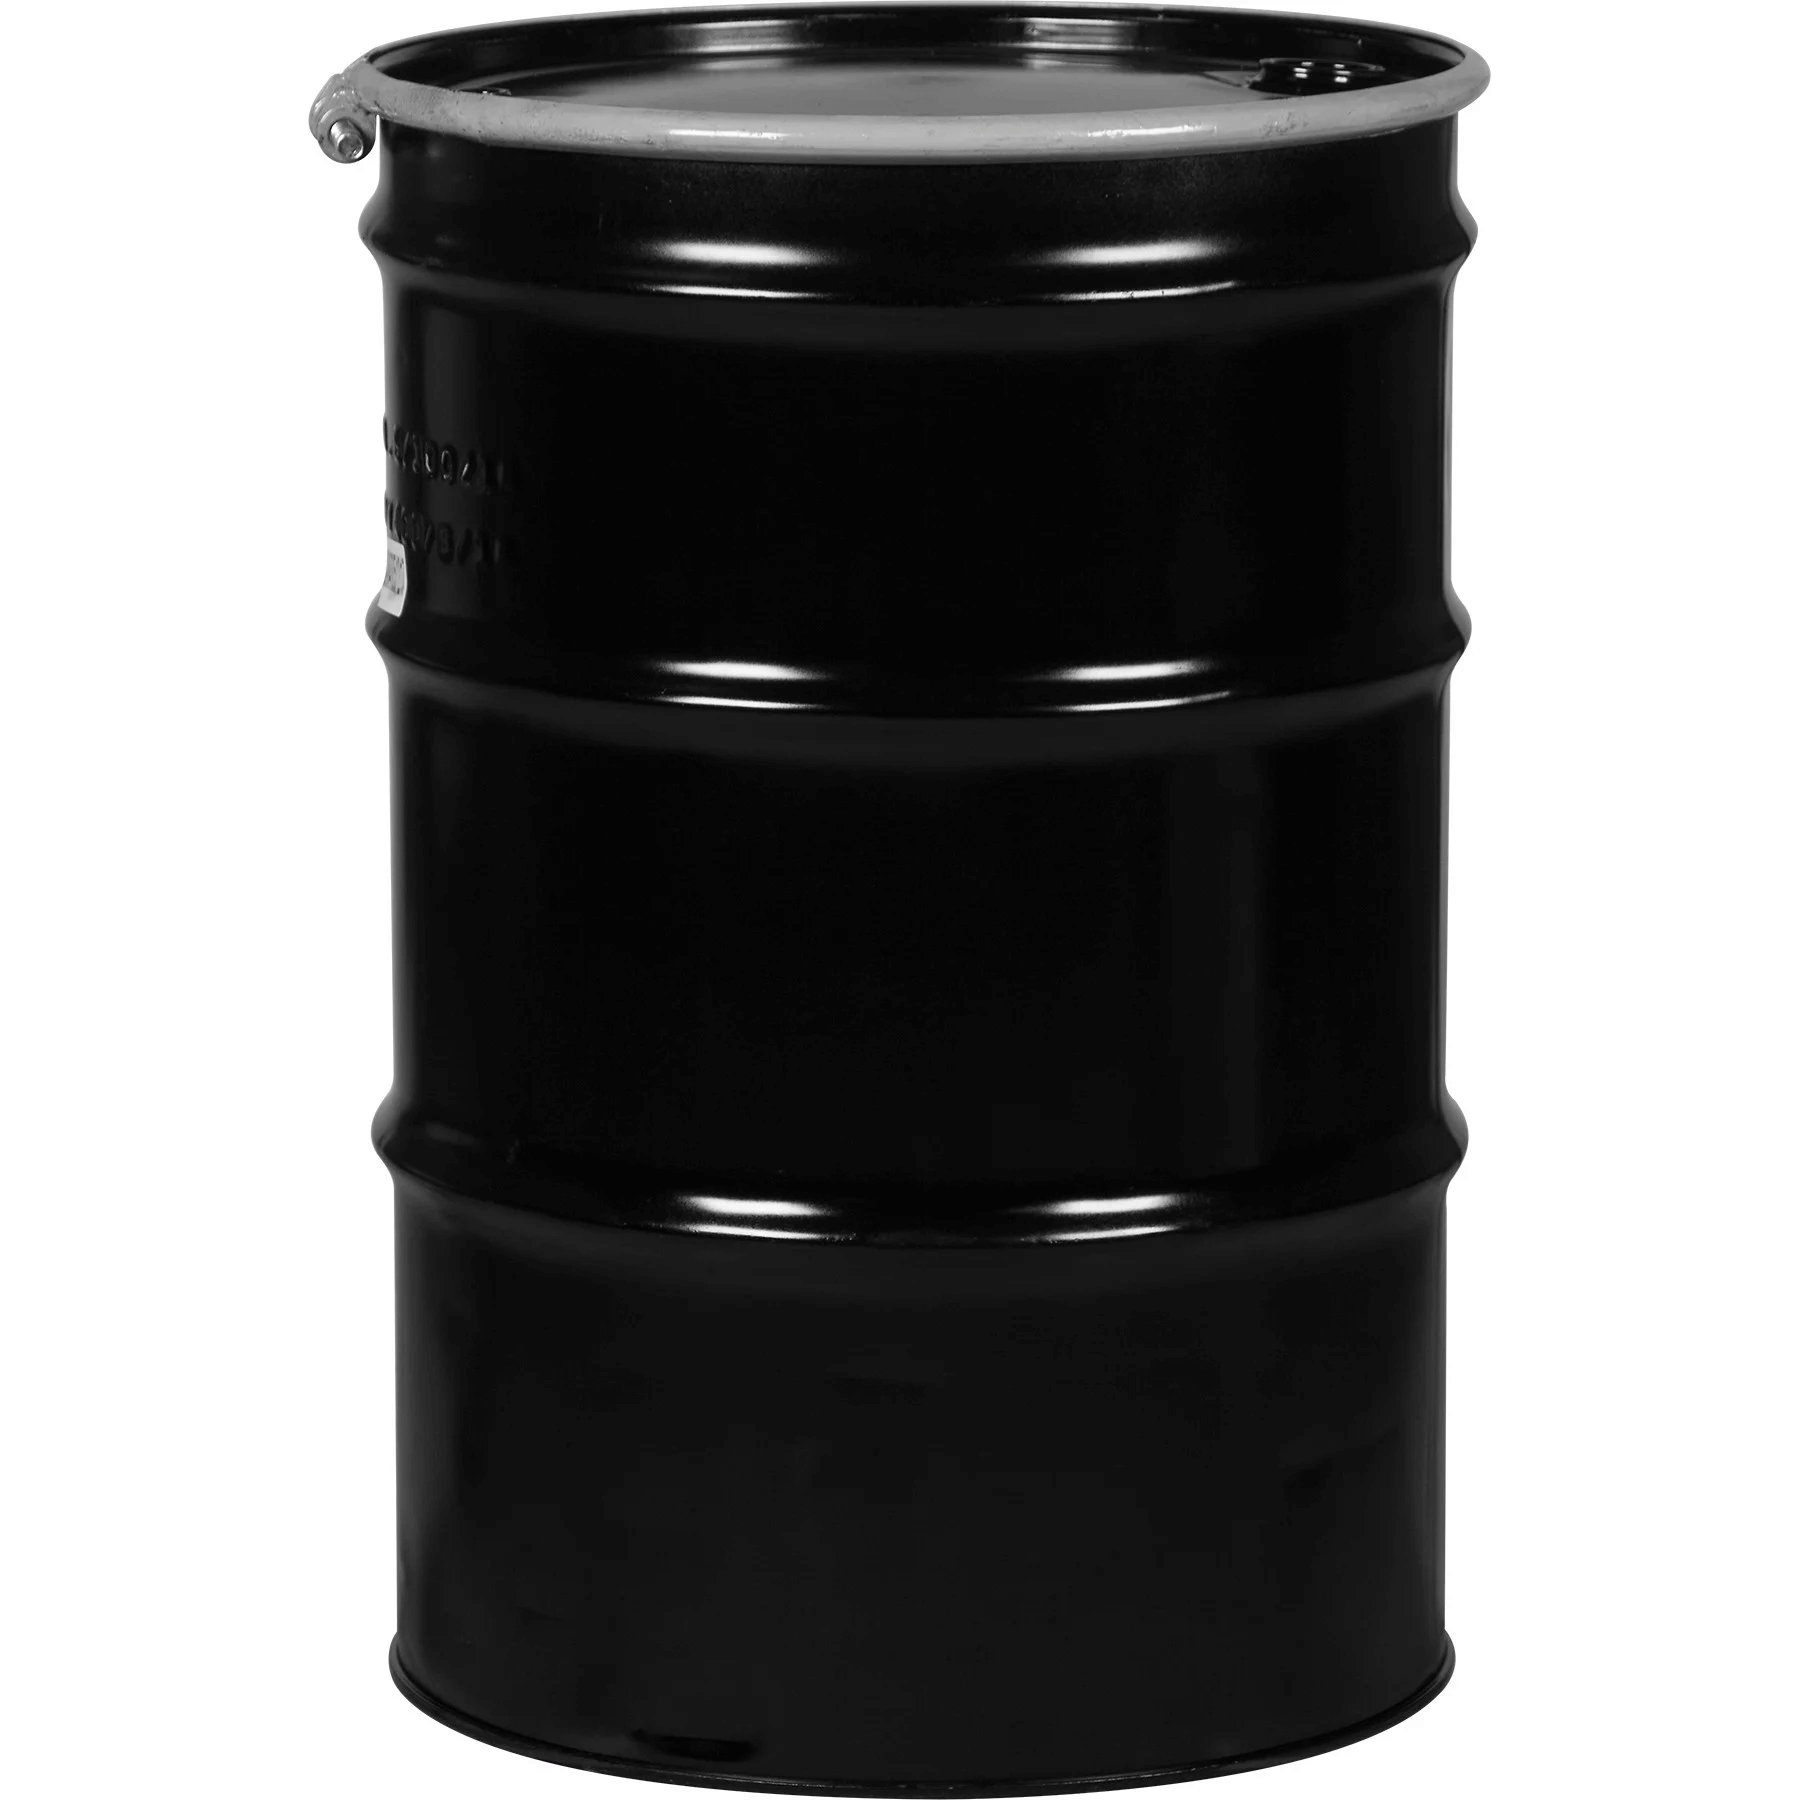 Recovery Drum - Plastic (95 Gallon)